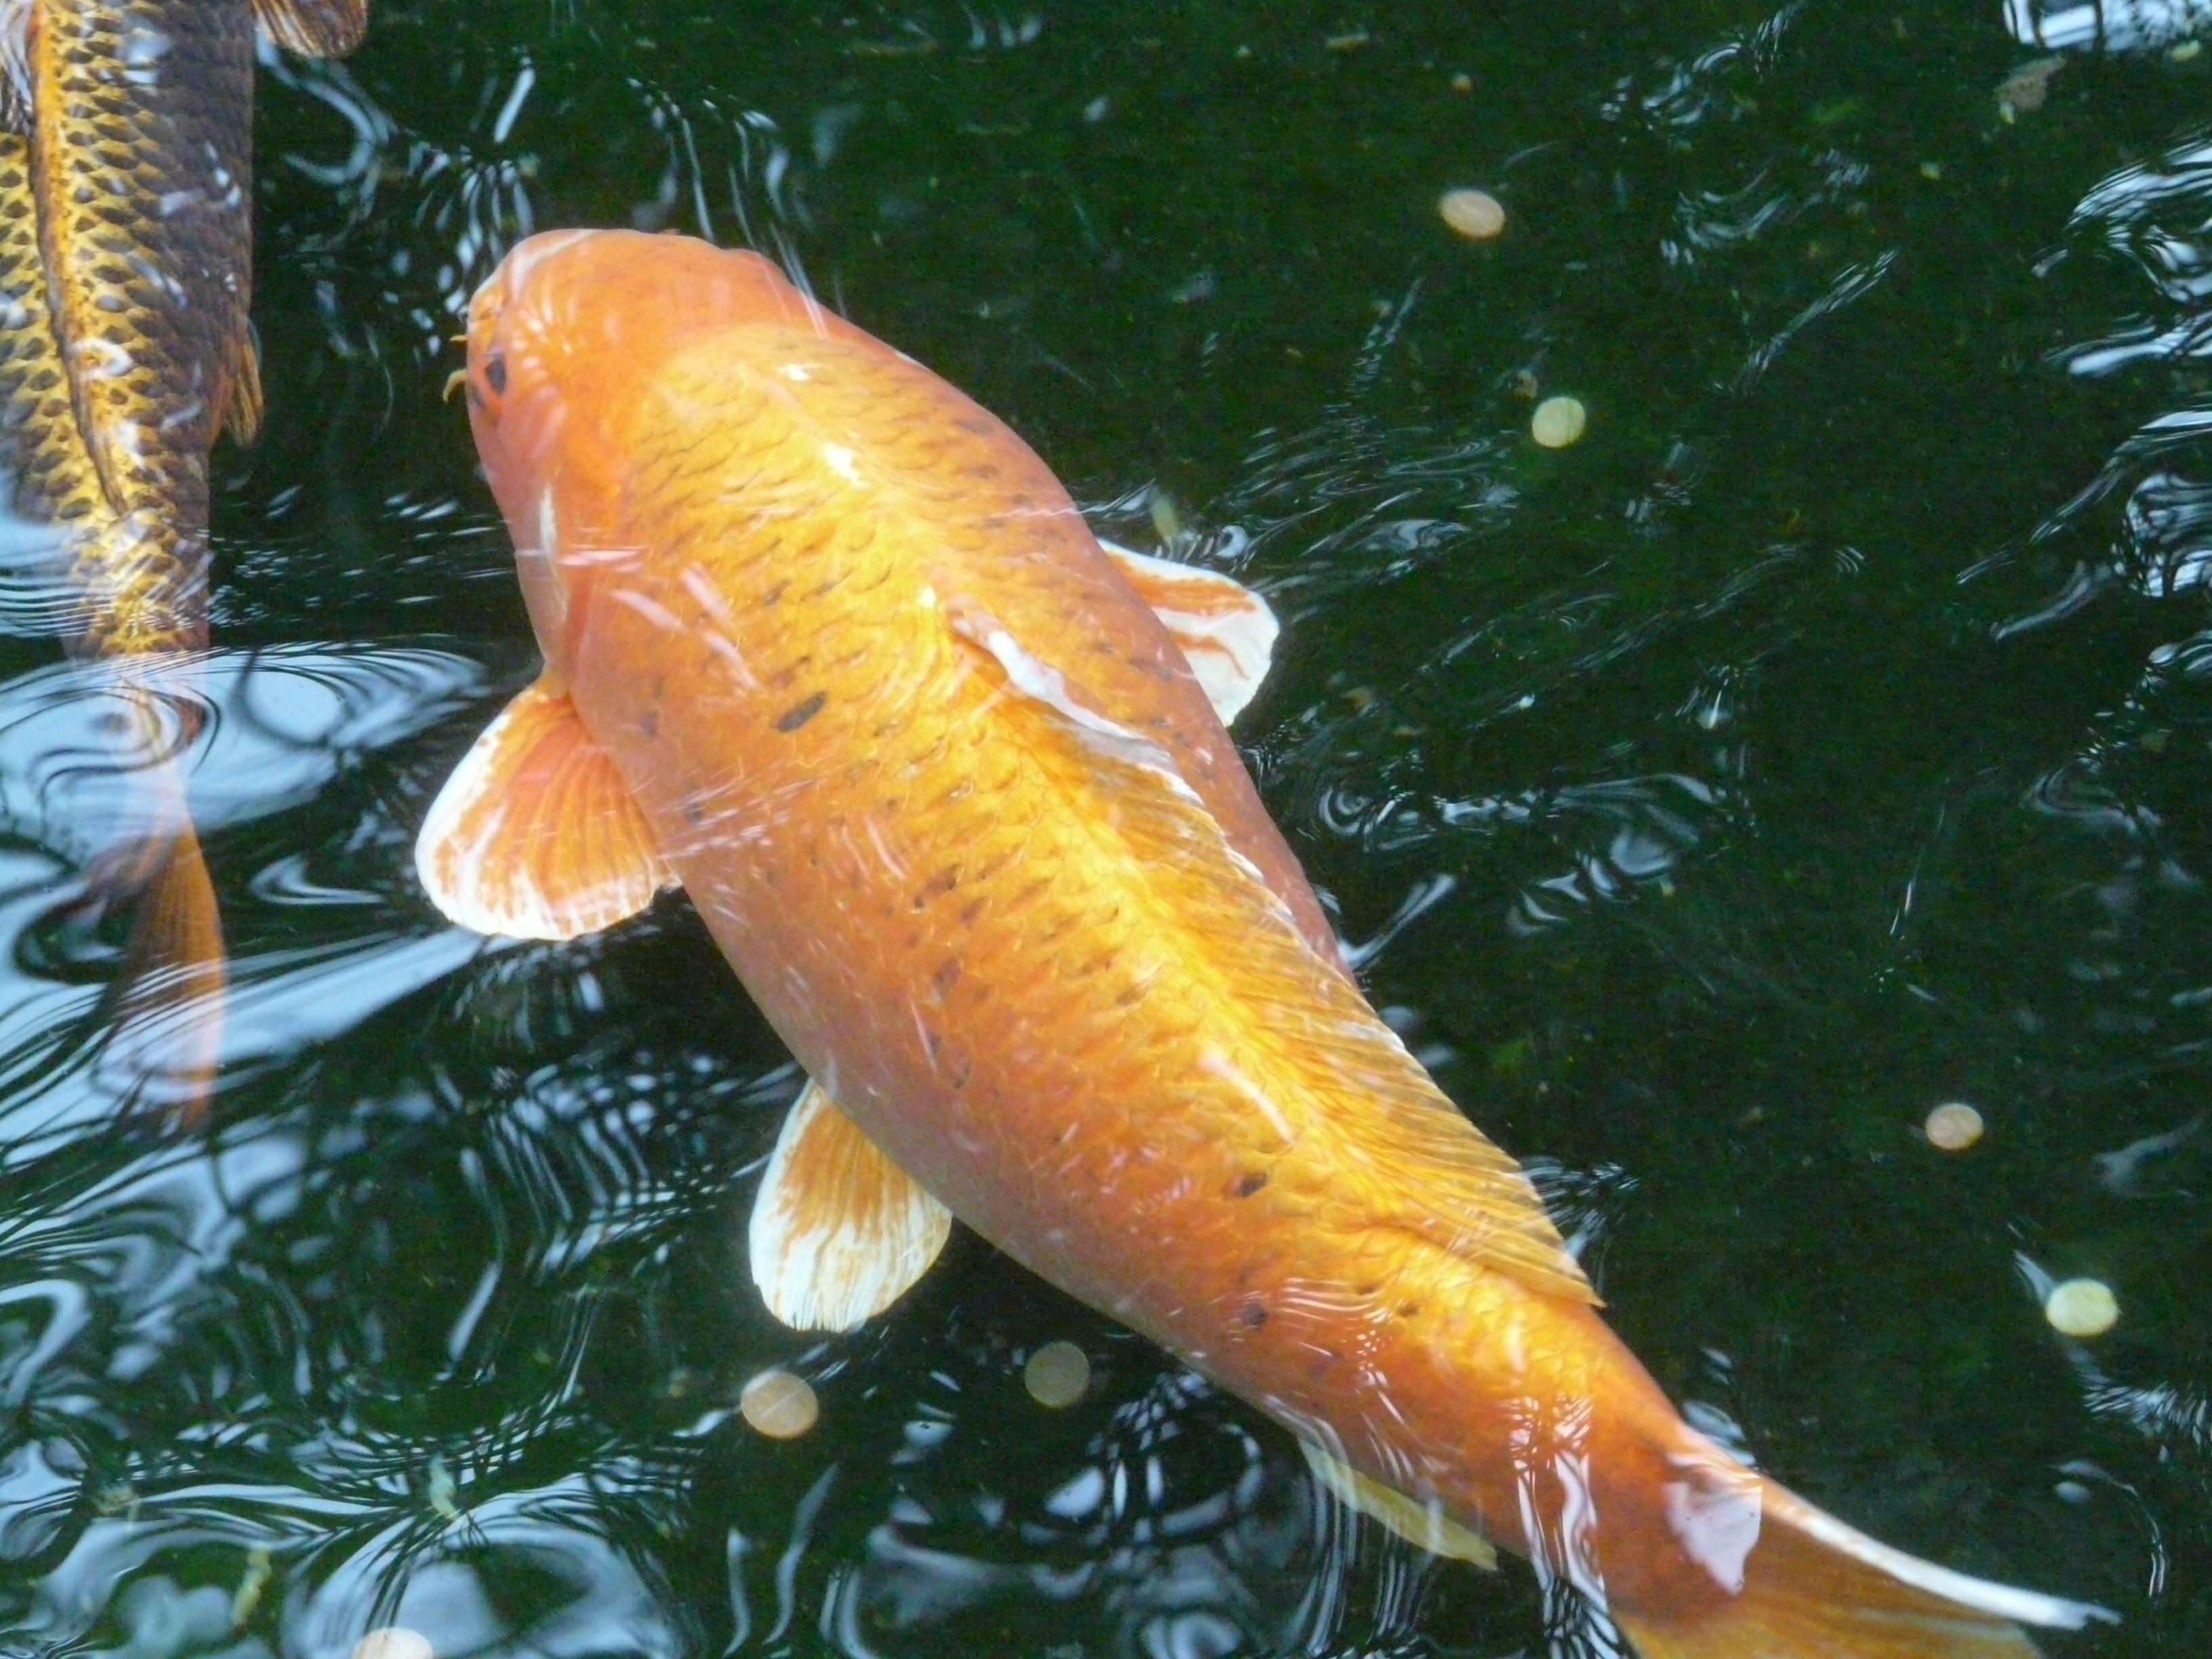 Fotos gratis : agua, mojado, animal, nadar, escala, pescado, aleta ...